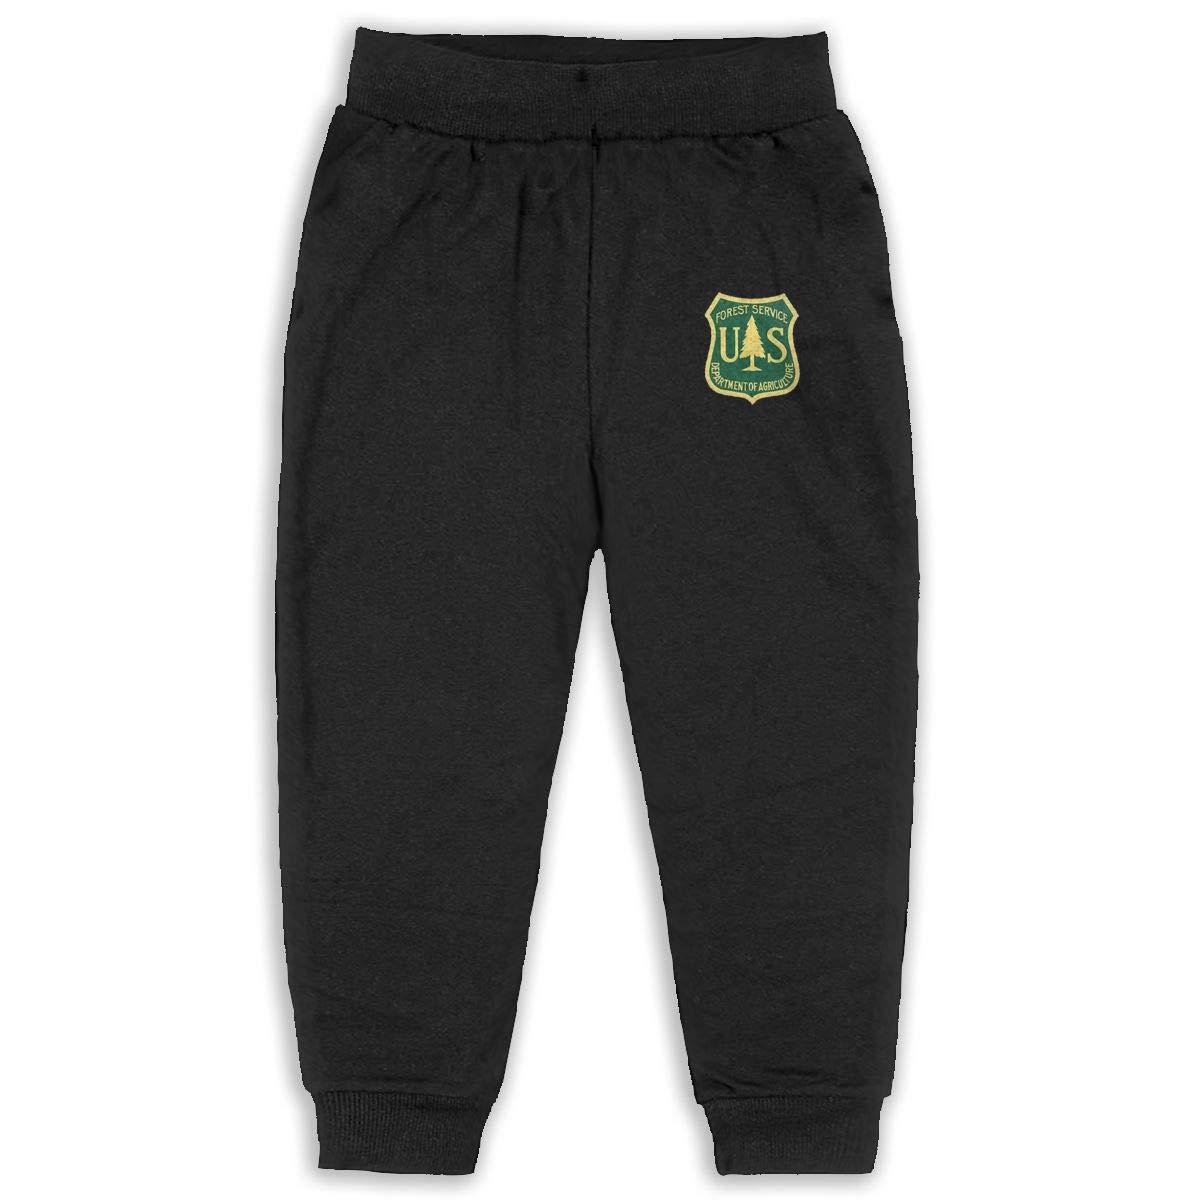 United States Forest Service Kids Cotton Sweatpants,Jogger Long Jersey Sweatpants